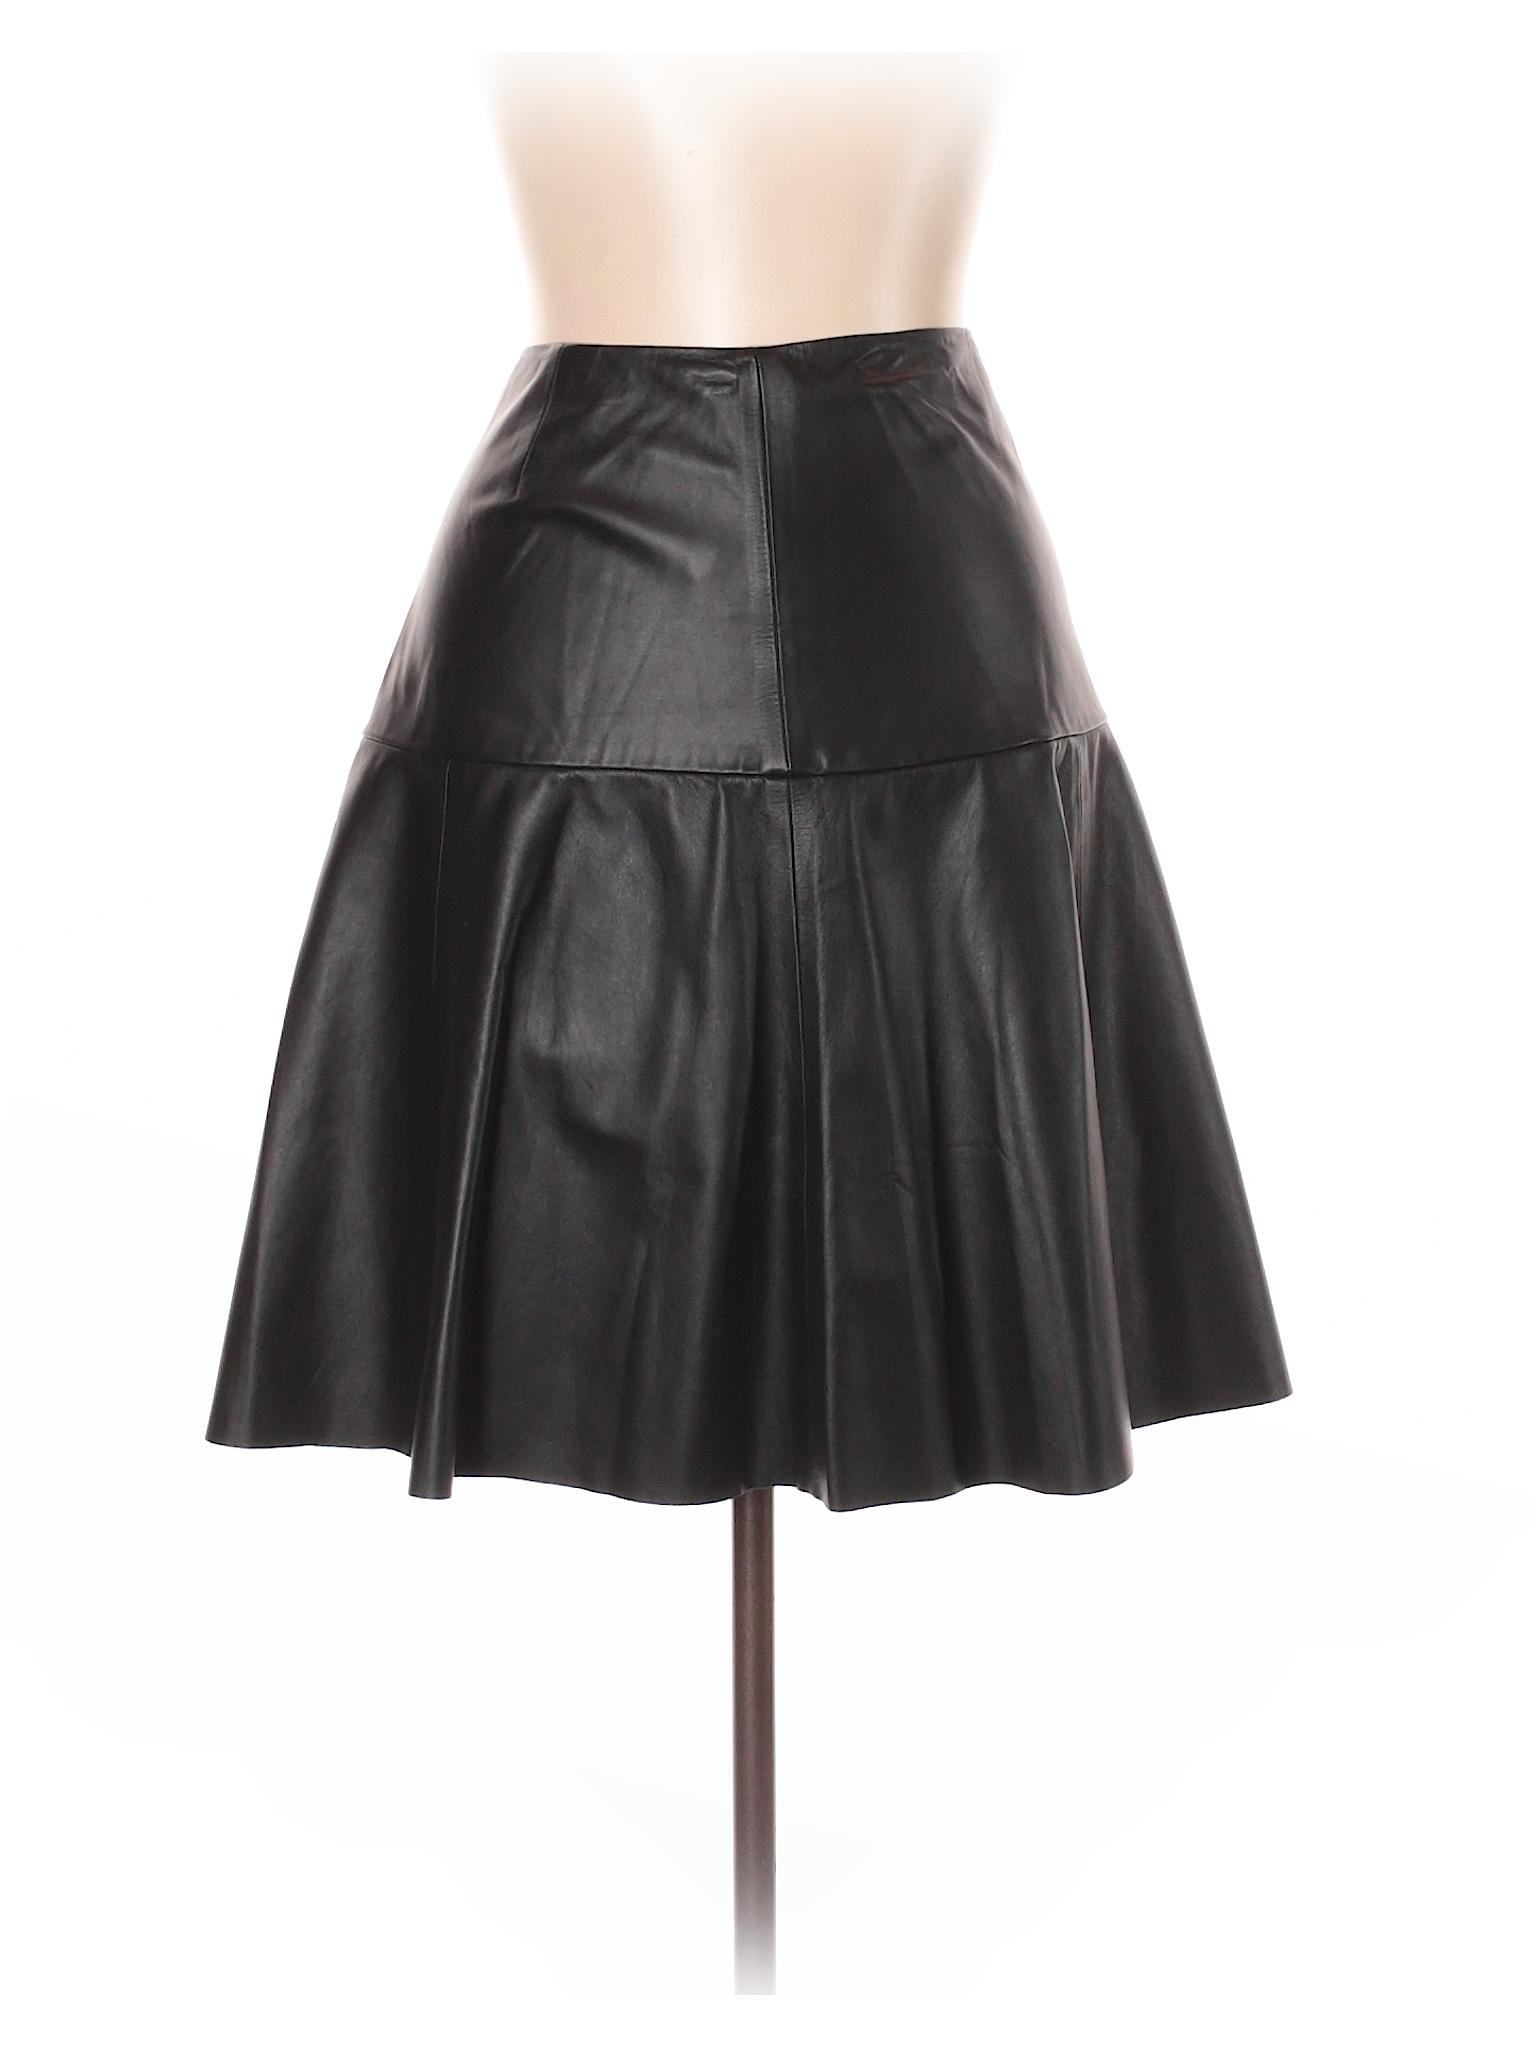 Skirt Ralph Leather Boutique Lauren by leisure Lauren YqFFwnUB